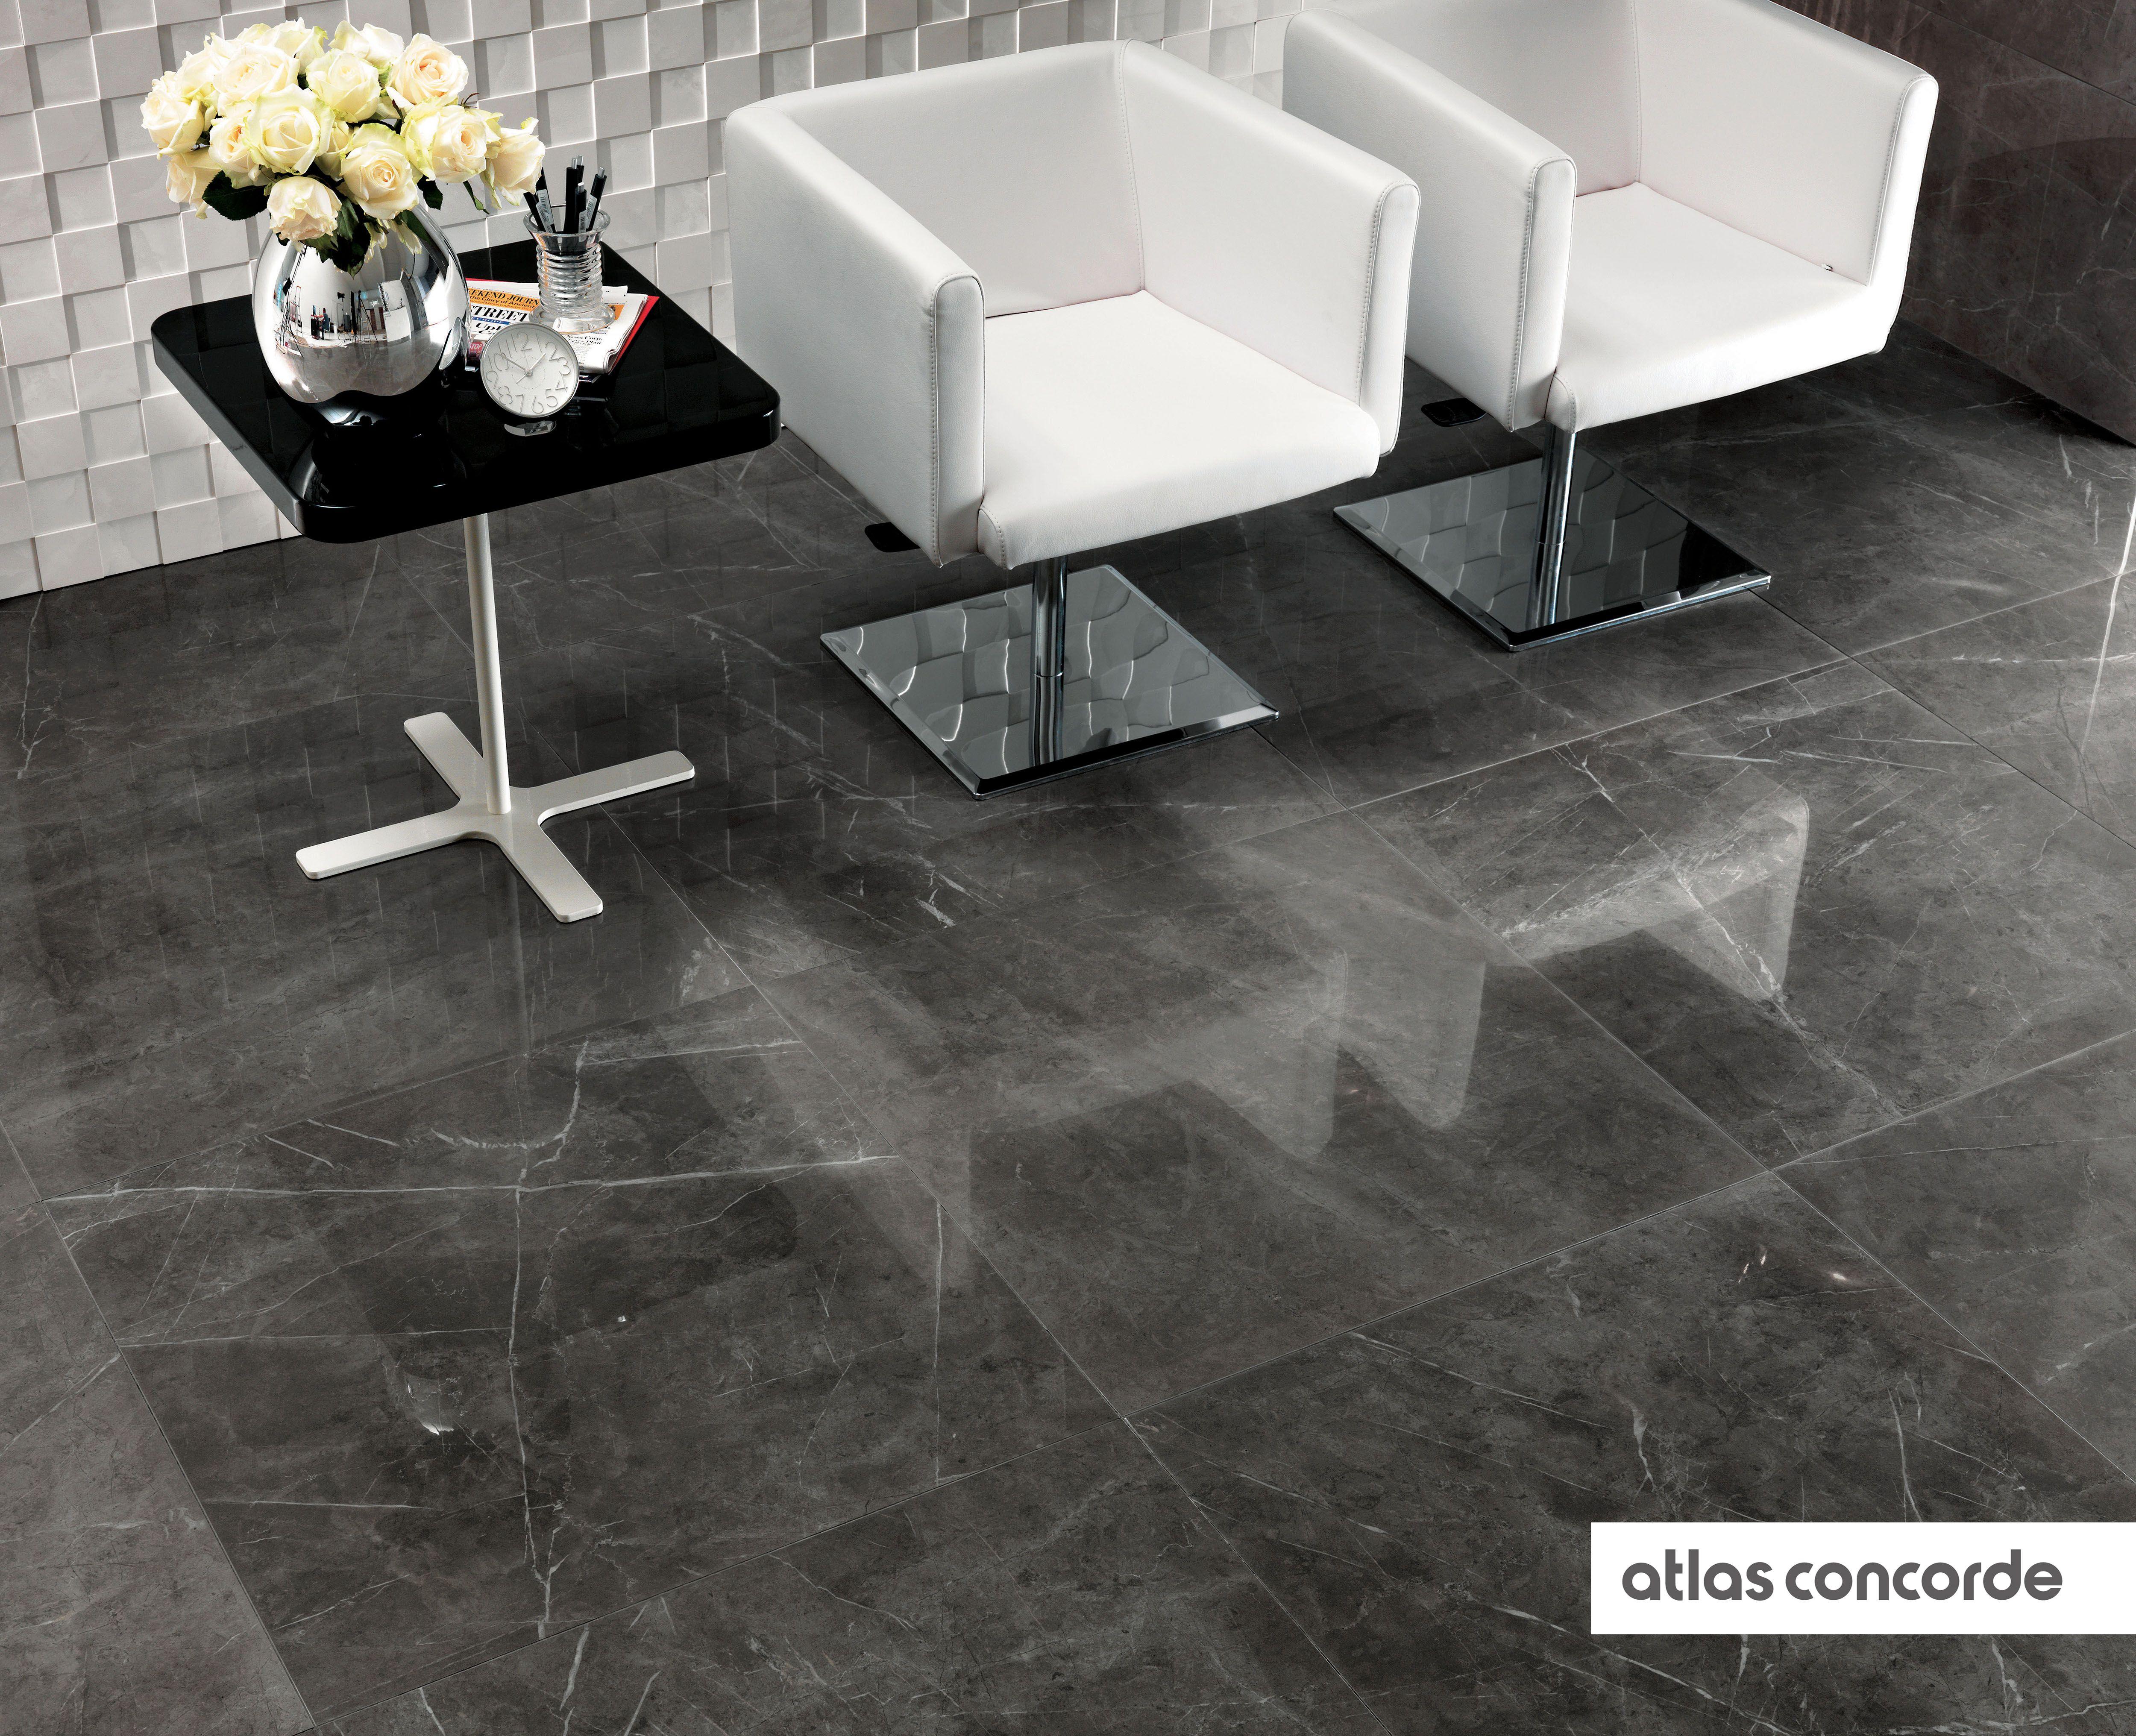 Marvel grey floor design atlasconcorde tiles ceramic marvel grey floor design atlasconcorde tiles ceramic doublecrazyfo Gallery